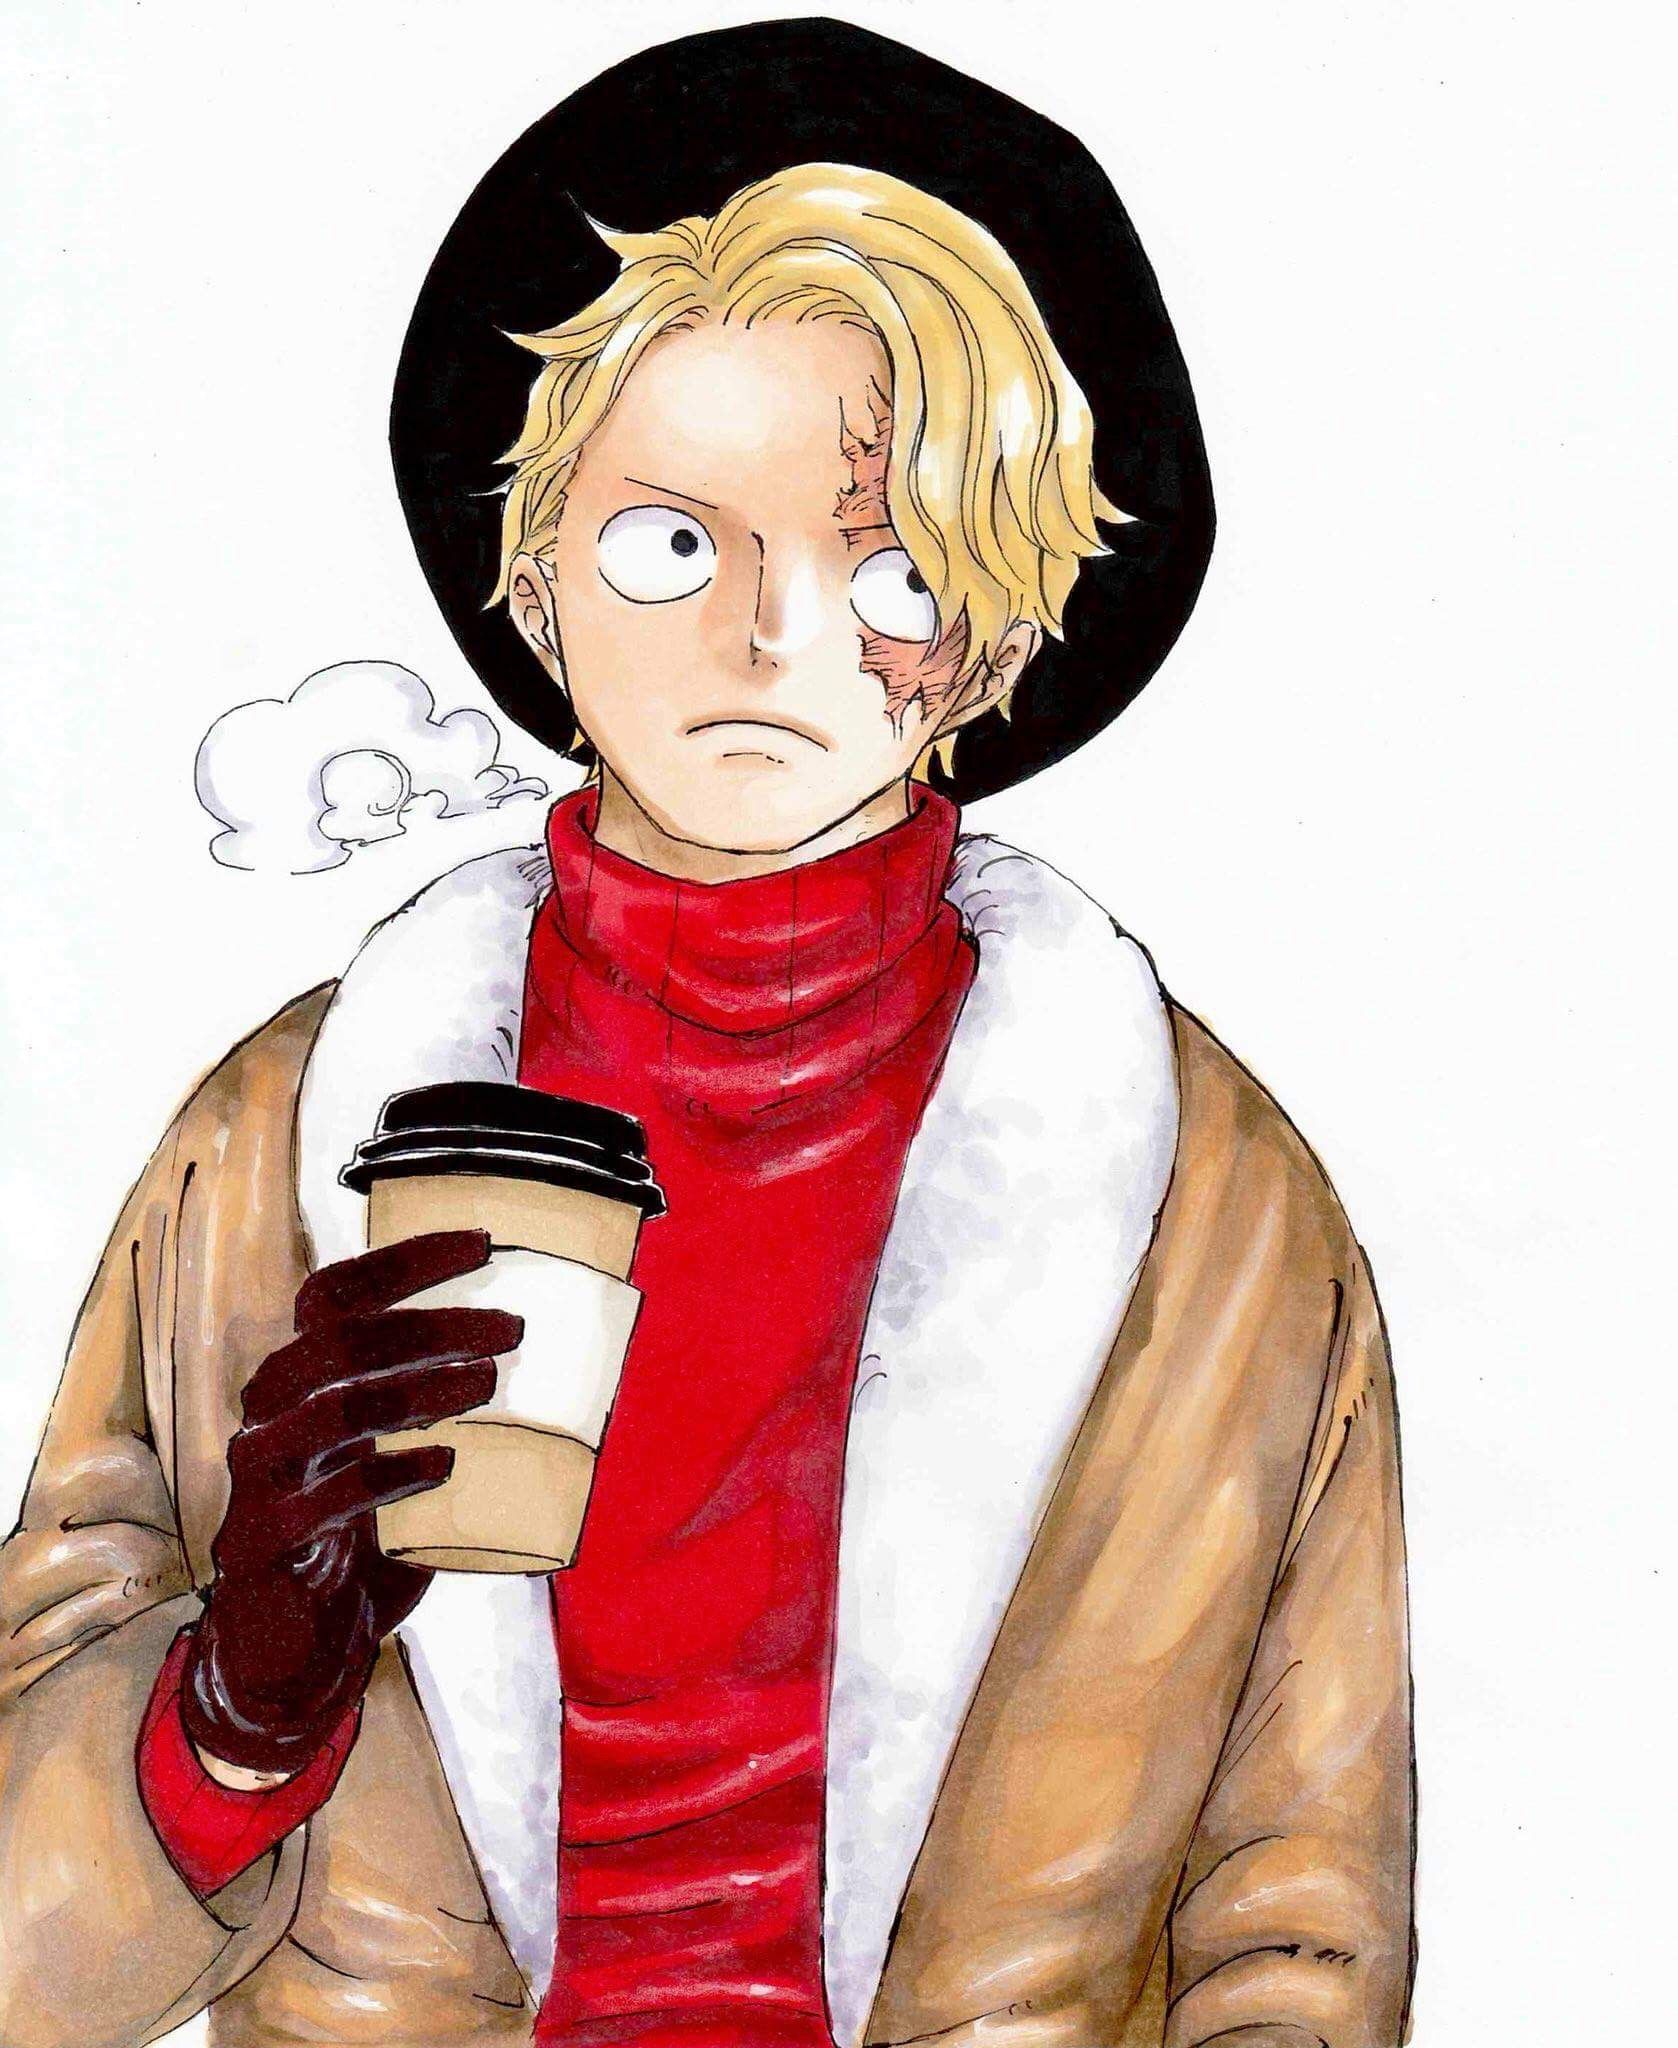 Pin By ღ 𝚔𝚞𝚛𝚘𝚜𝚊𝚔𝚒 ღ On One Piece Manga Anime One Piece One Piece Drawing One Piece Manga